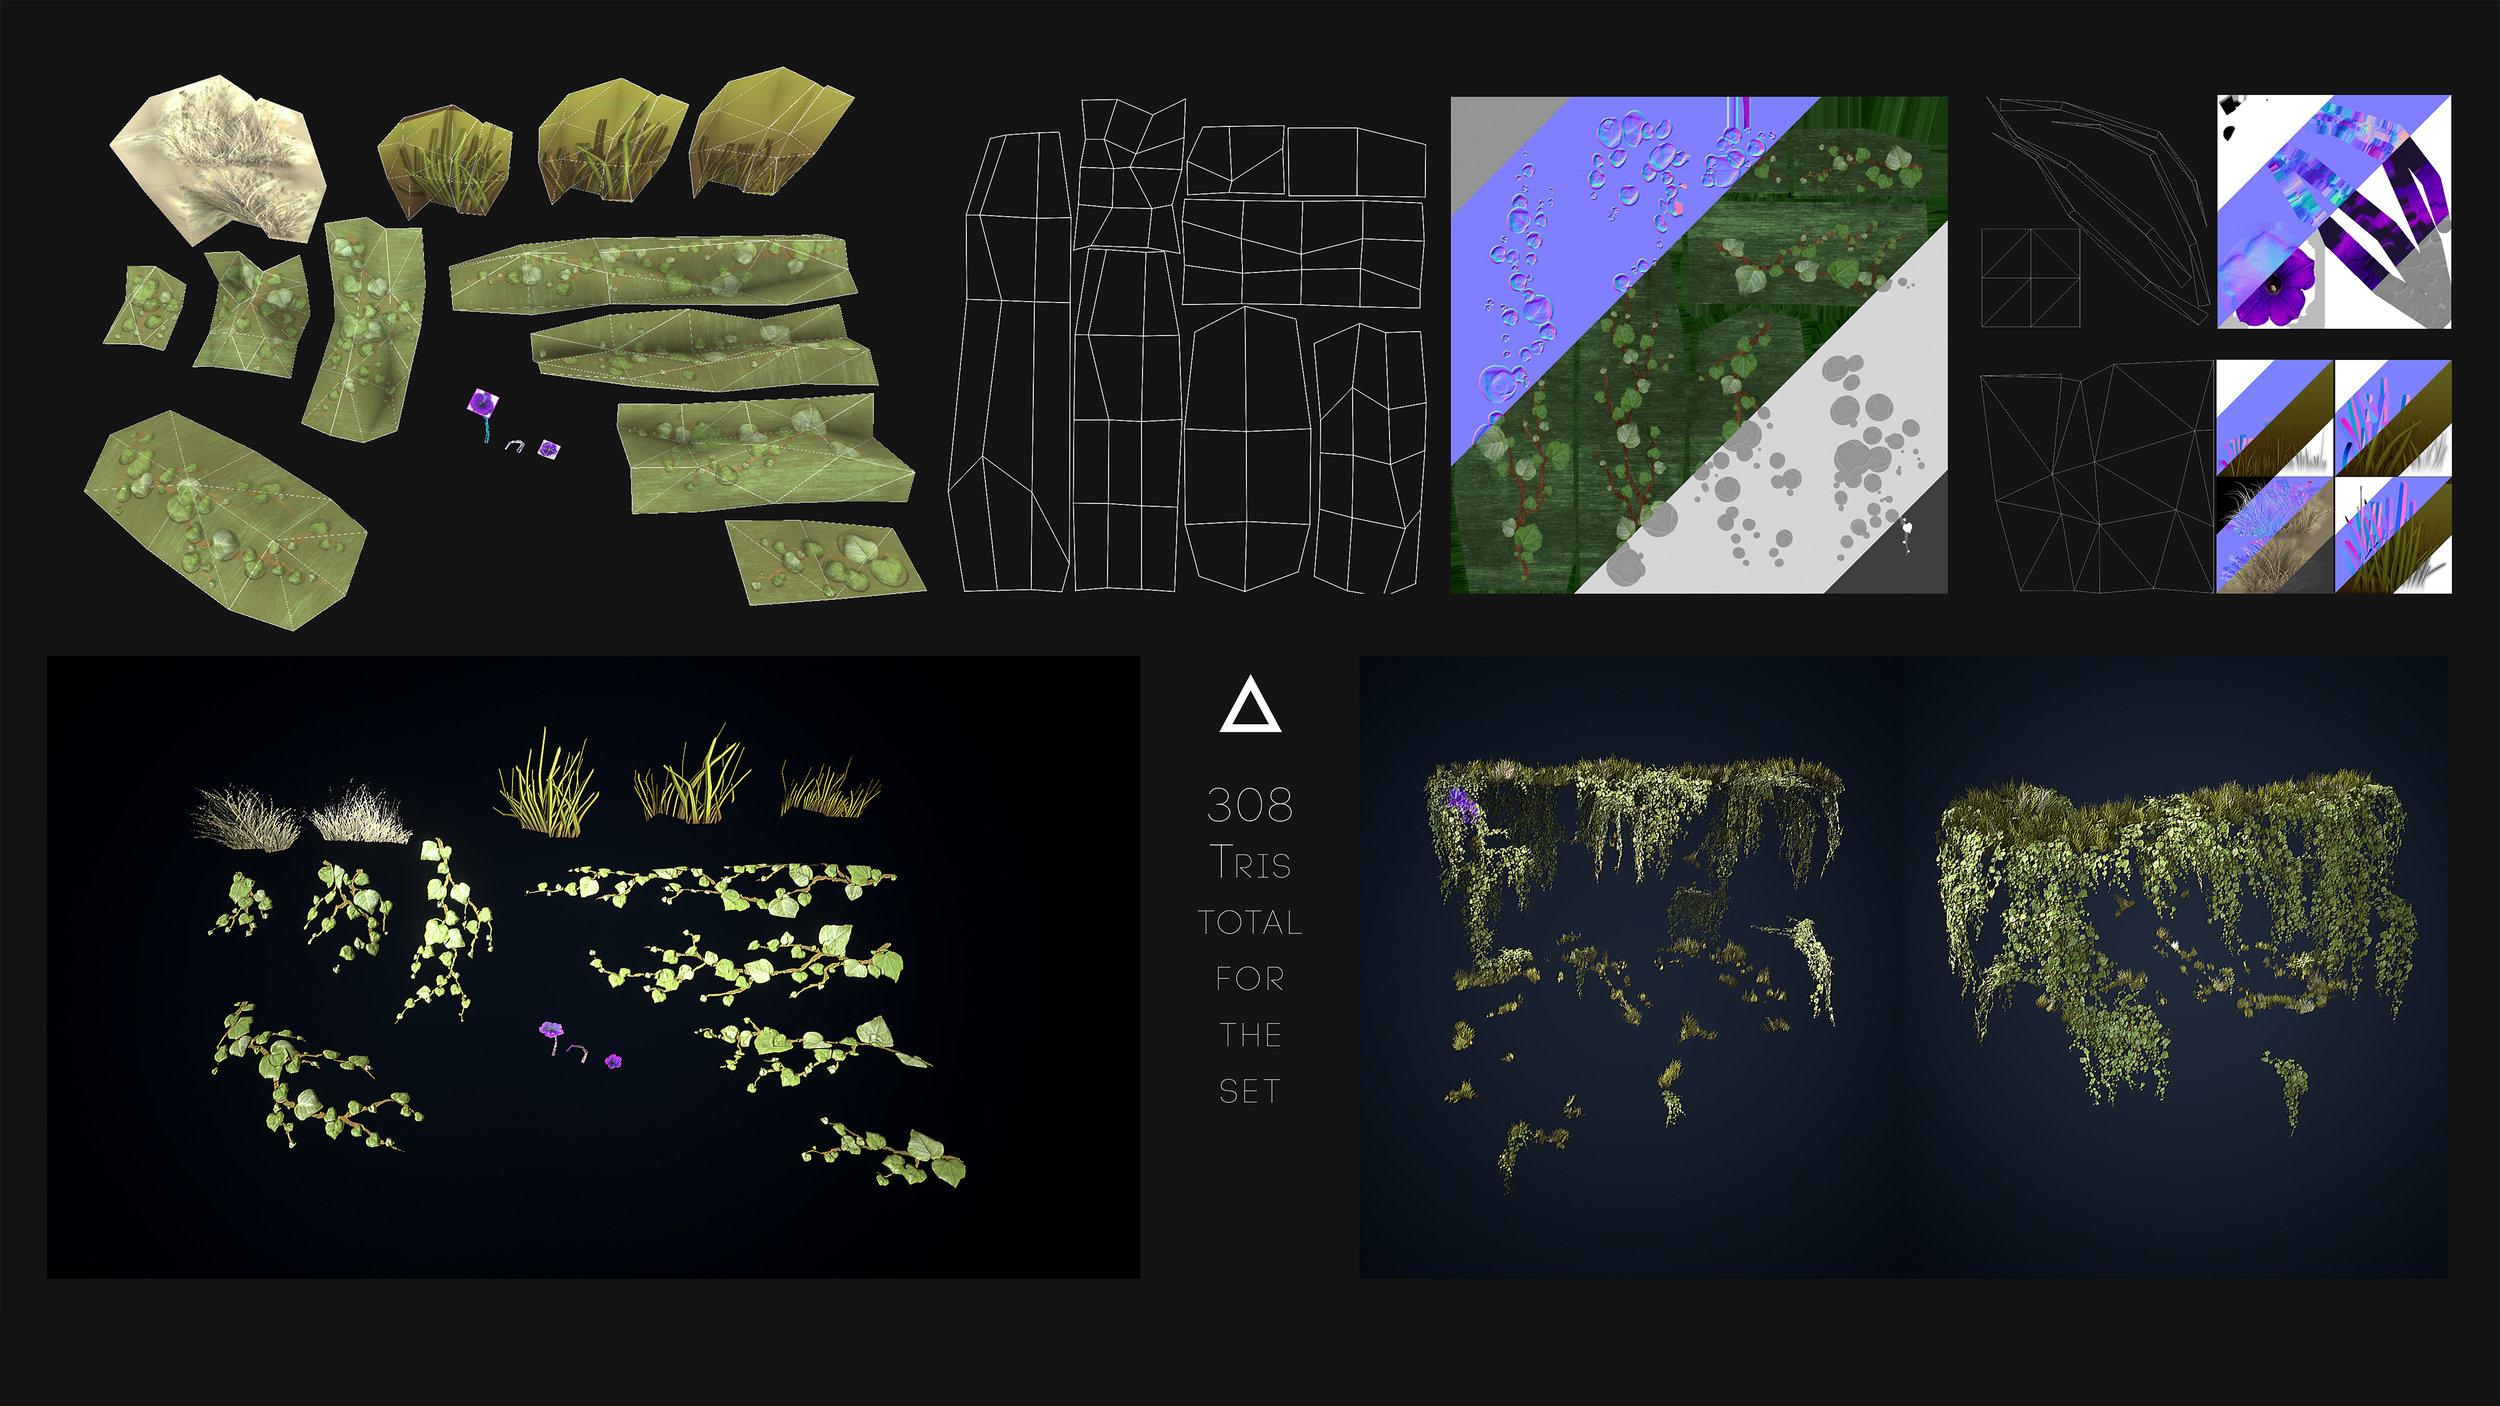 Nikita_Kotter_Portfolio_3DModelingForGames-23.jpg